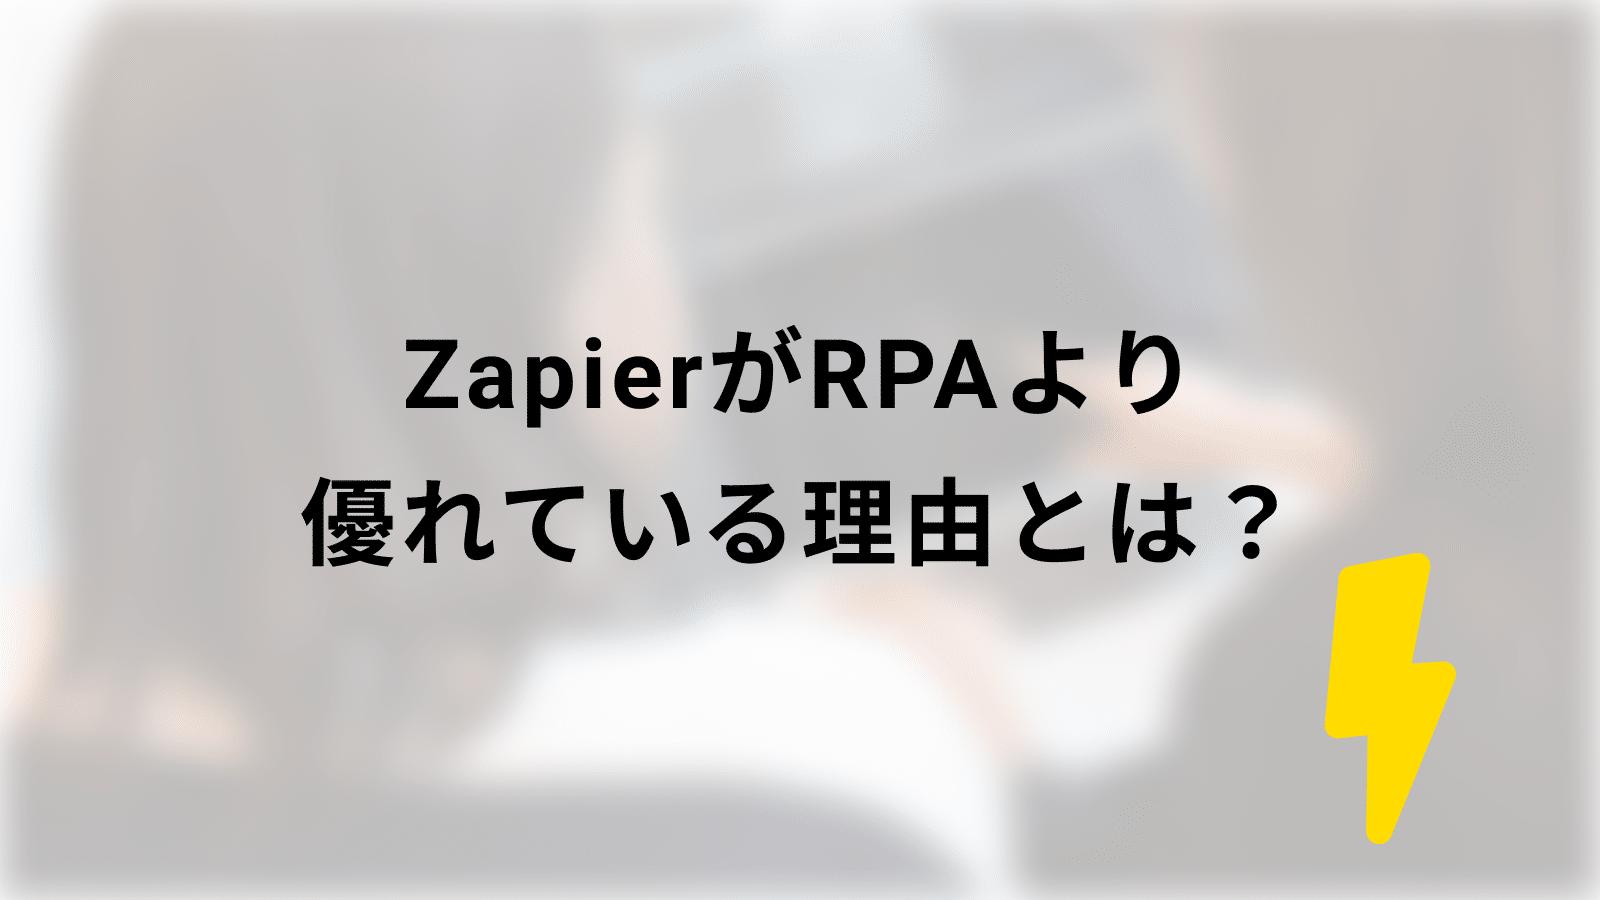 ZapierがRPAより優れている理由とは?